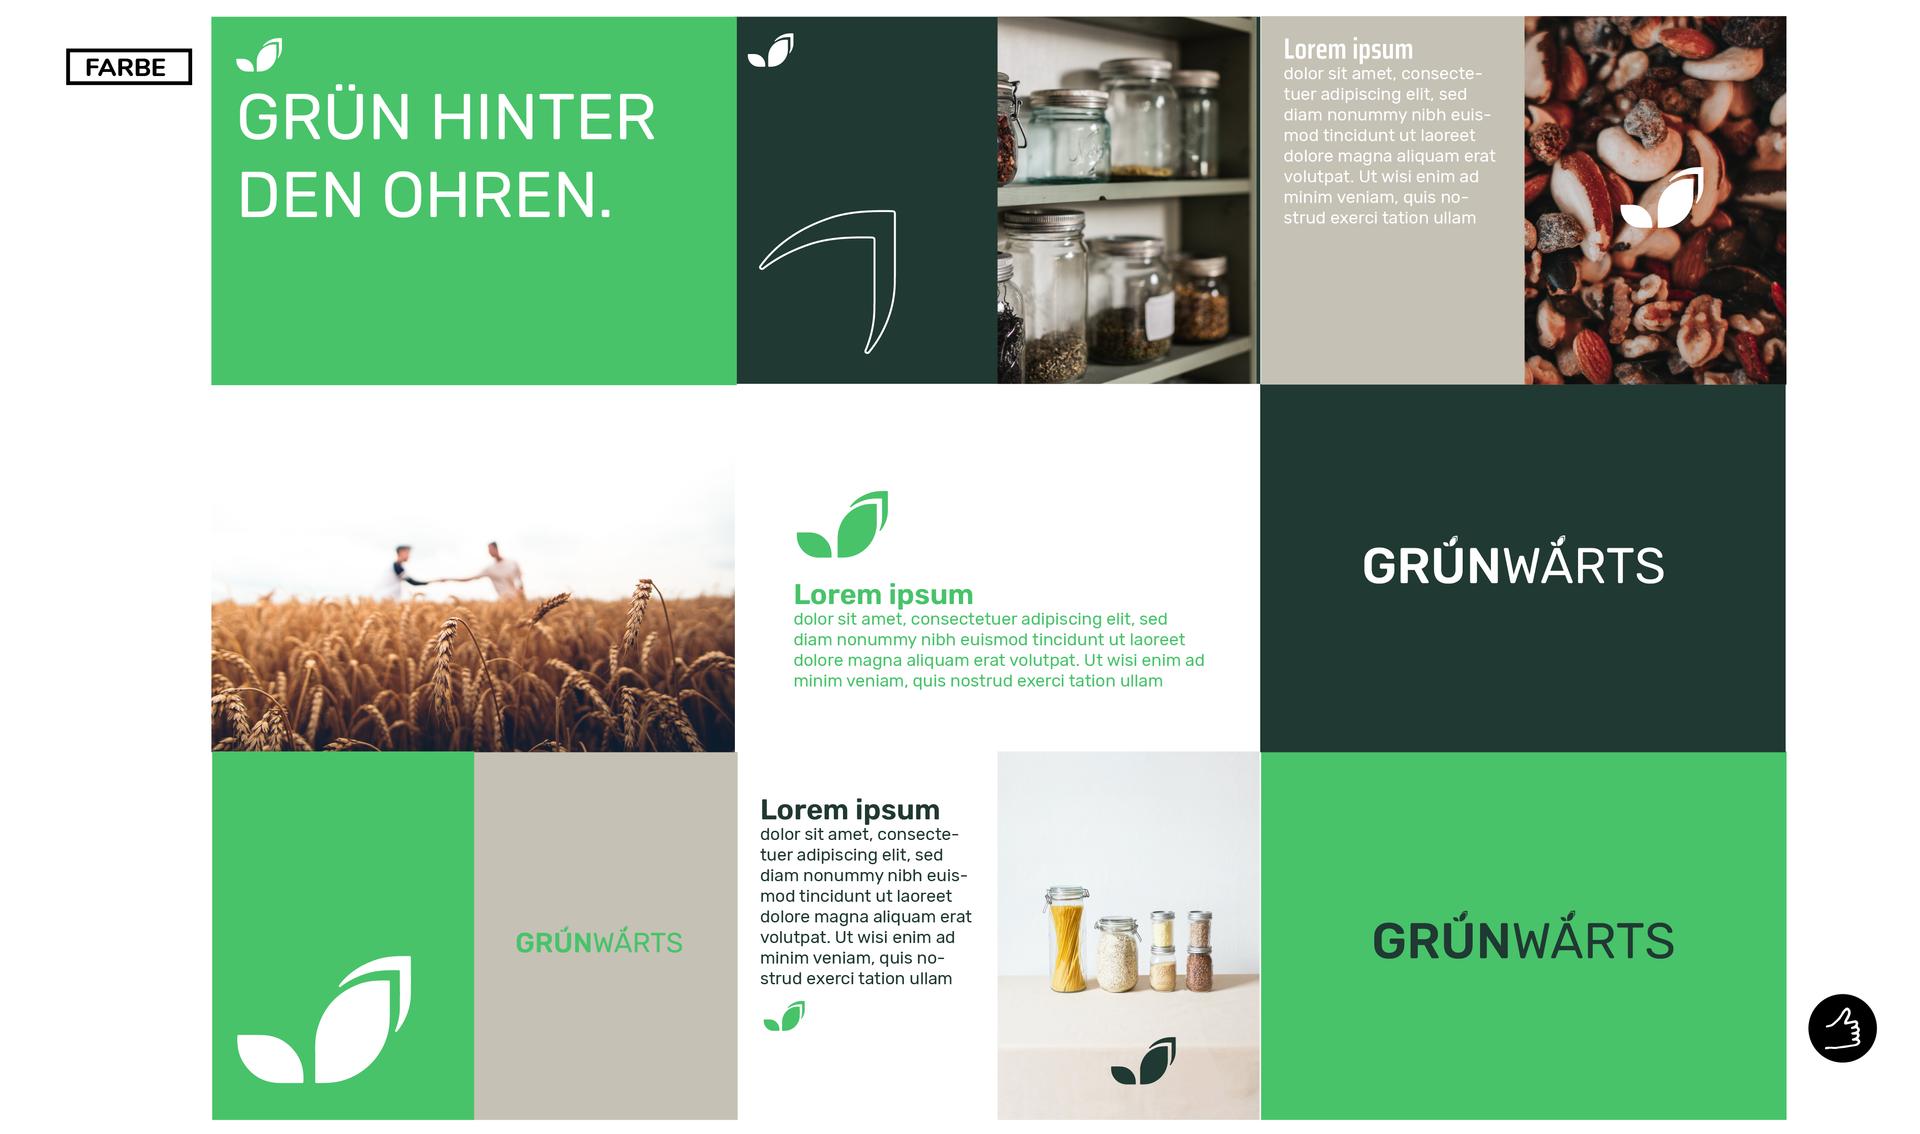 gruenwaerts(2)-Farbe2.png